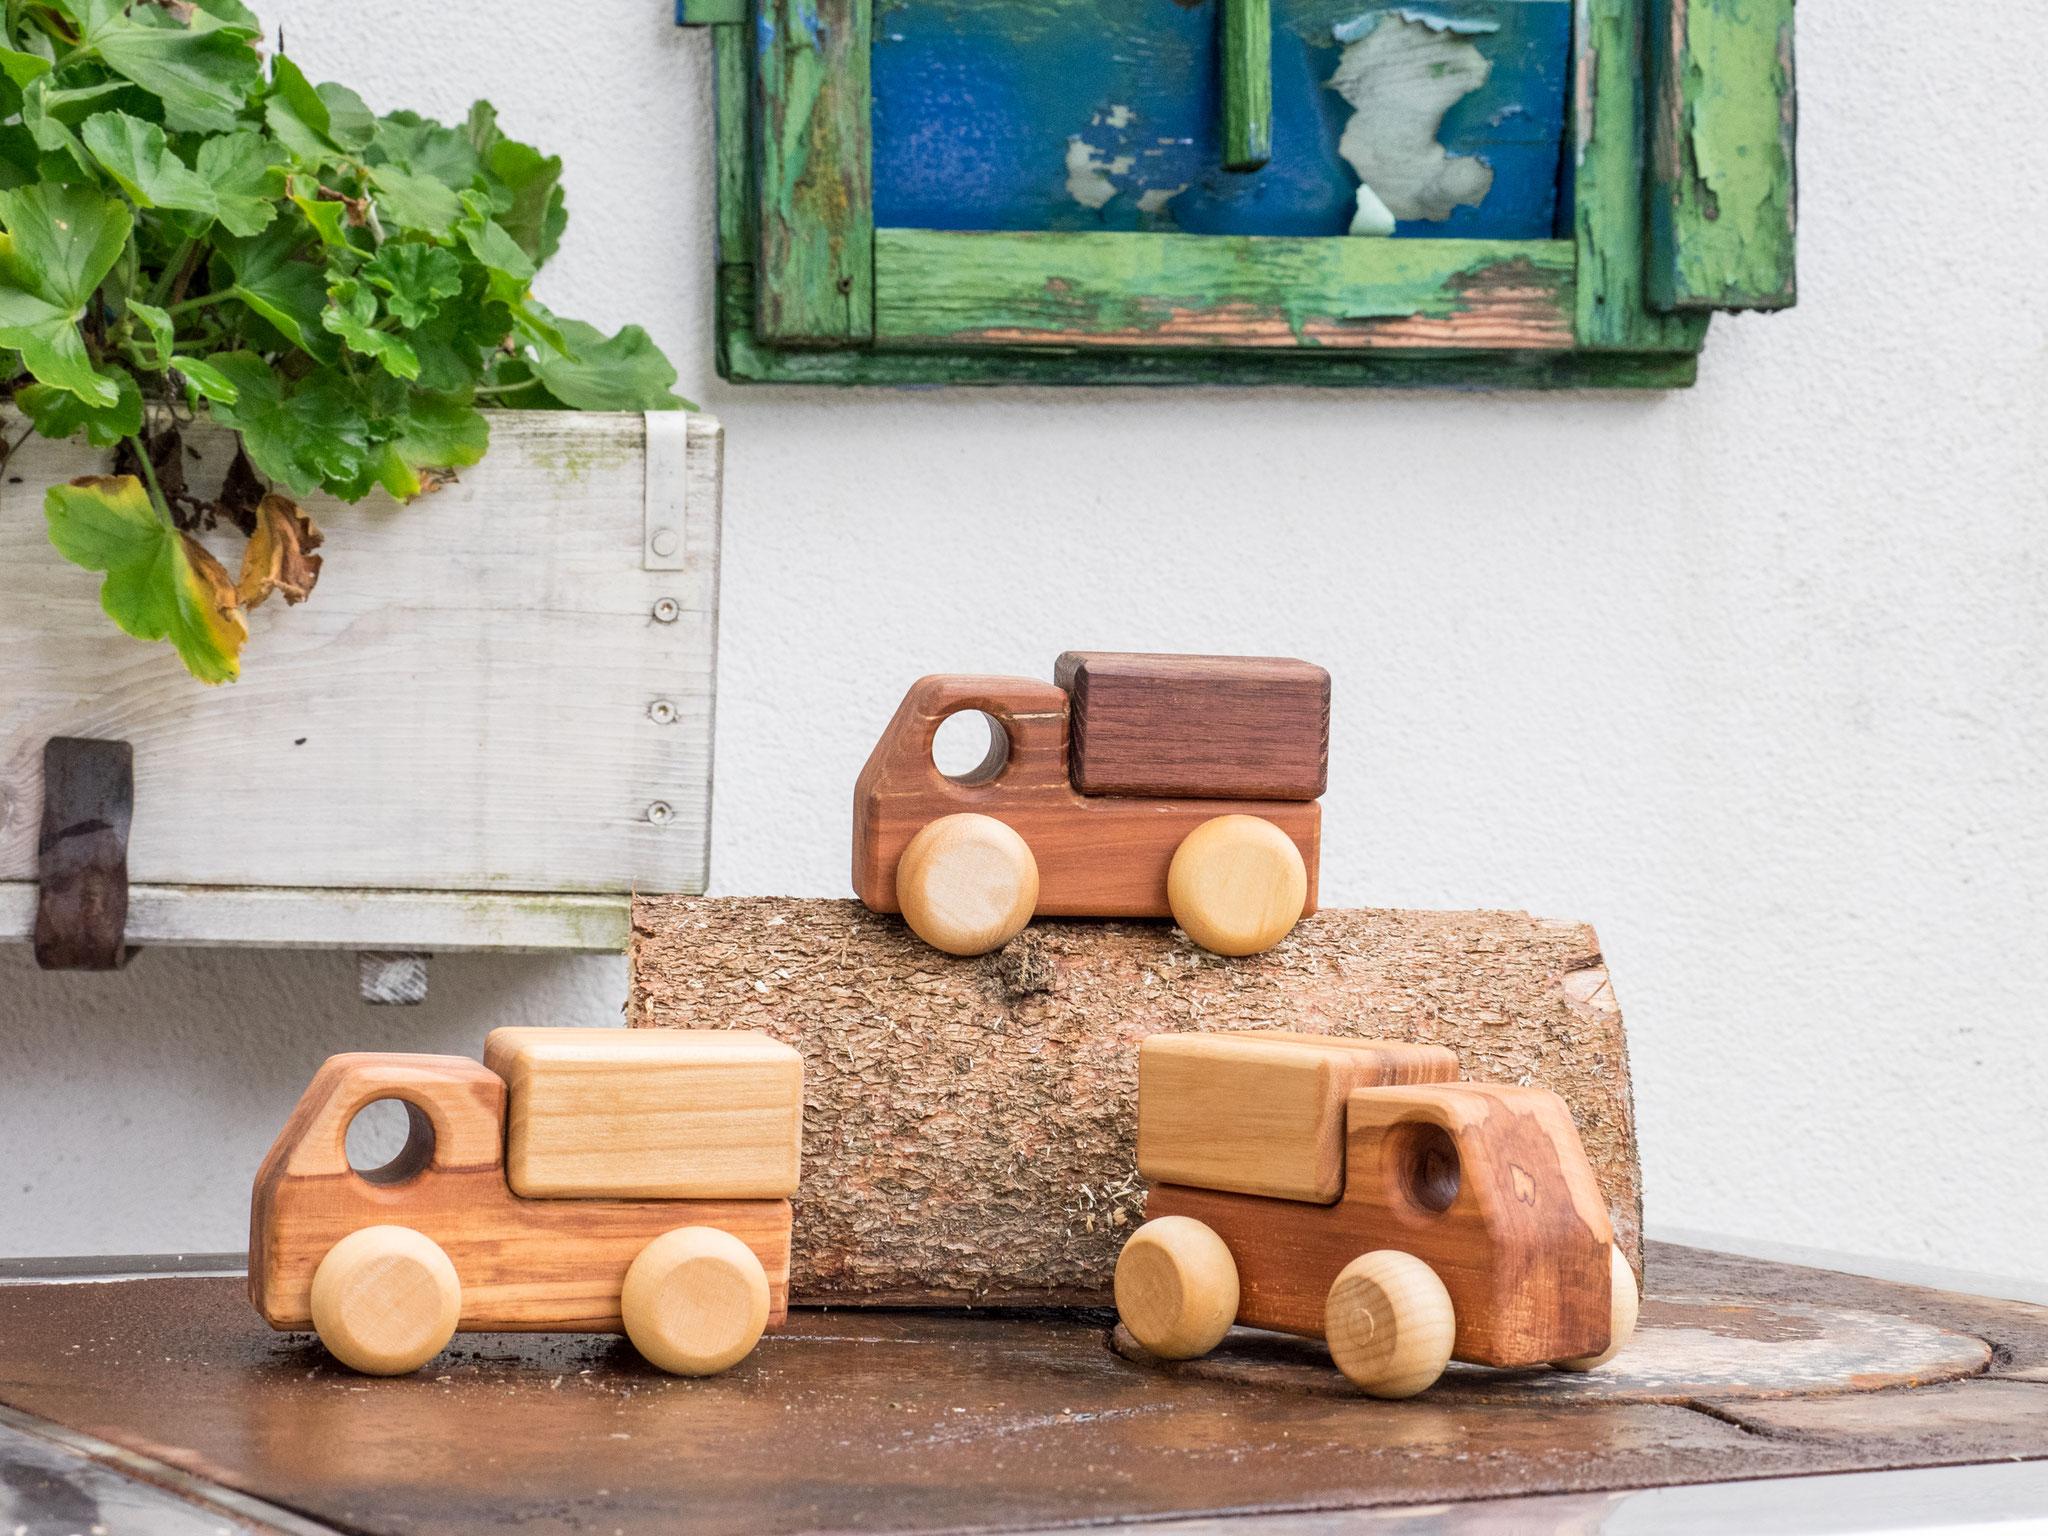 Kinderspielzeug aus Holz handgefertigt